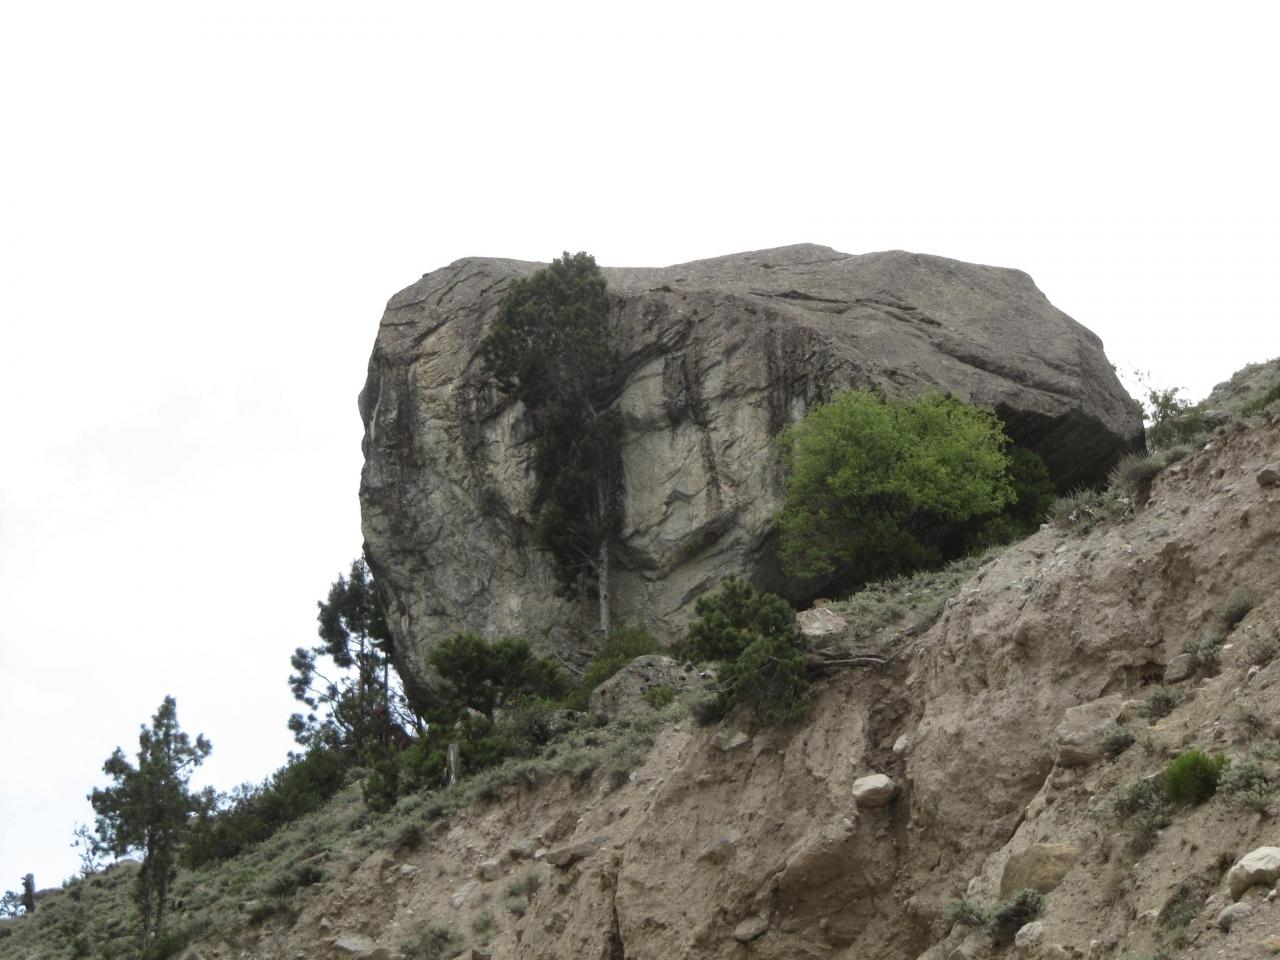 A picture from Nanga parbet by Shehryar Khattak